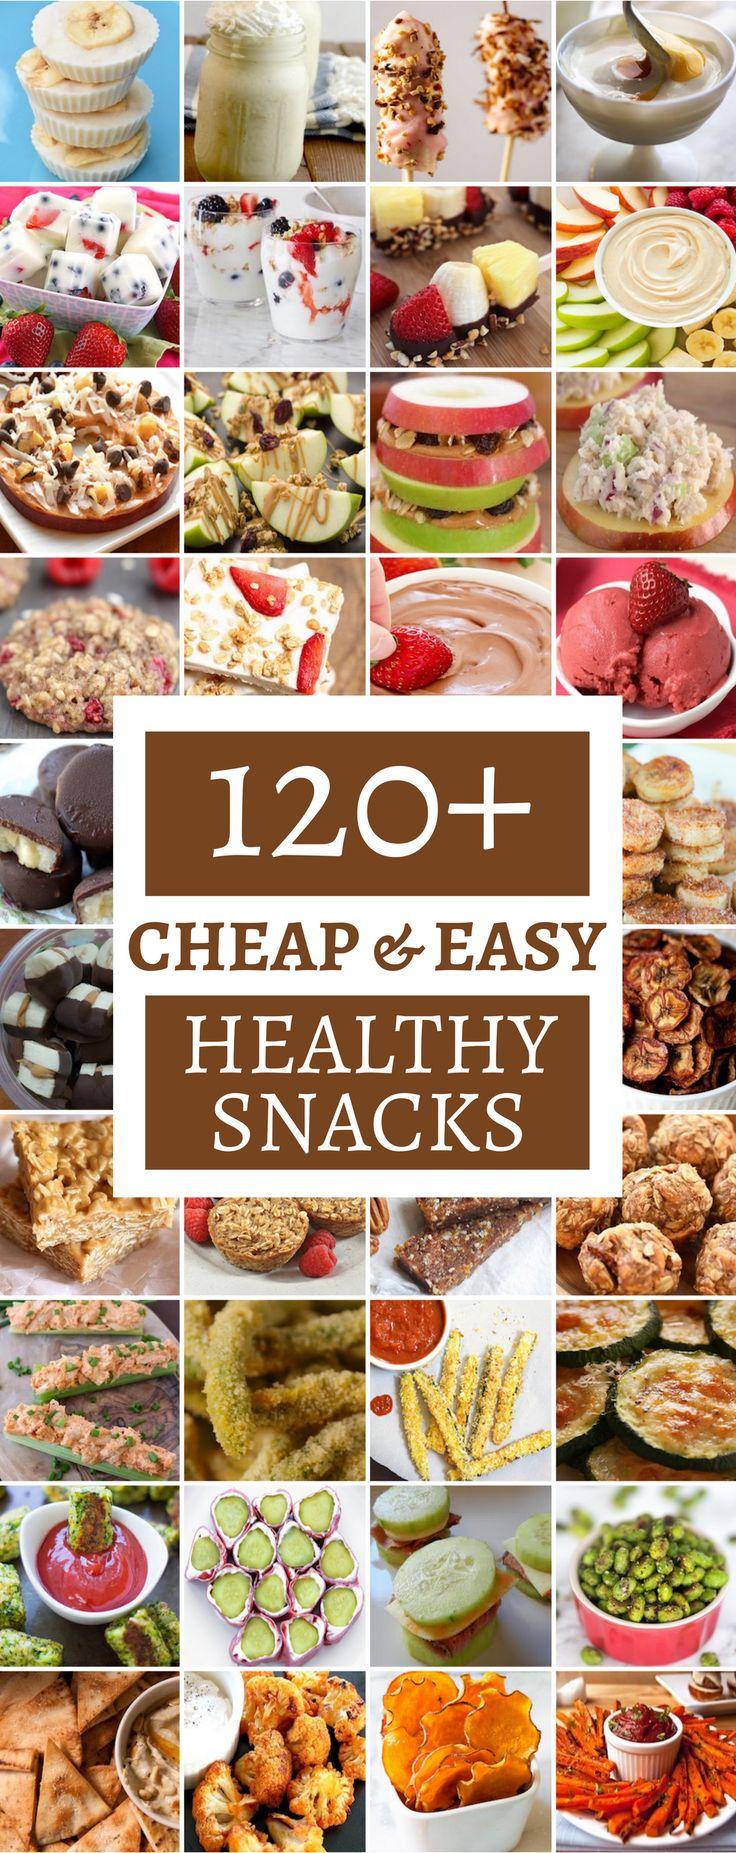 Best 20 Cheap healthy snacks ideas on Pinterest Cheap easy